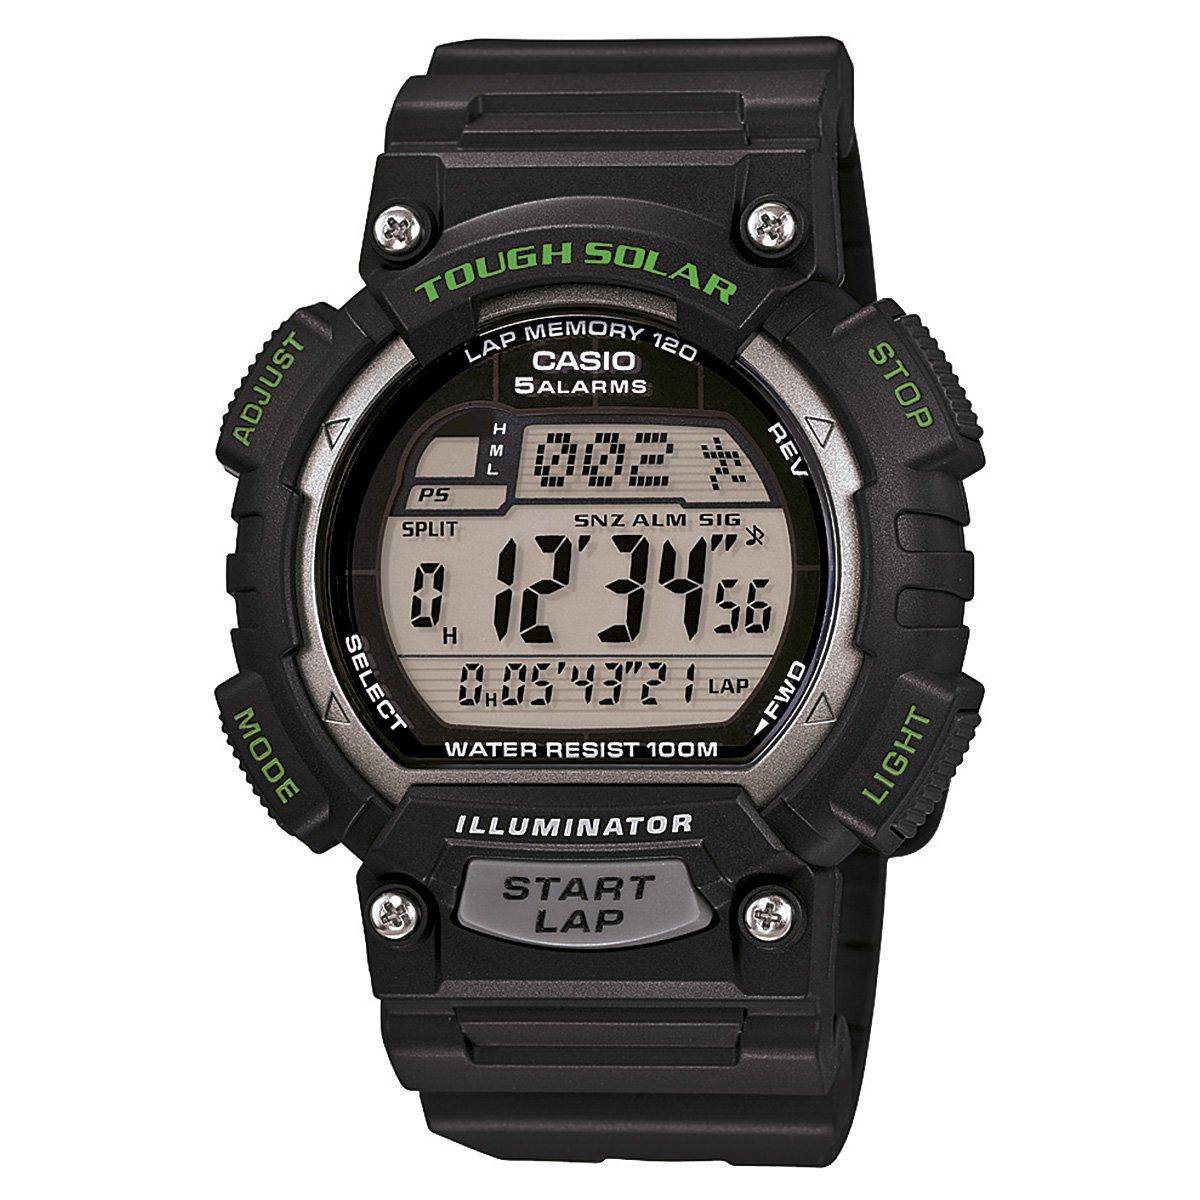 8b8d9a84780 Magali  Relógio Masculino Casio Anadigi AQ-S810W-1A2VDF - R  152